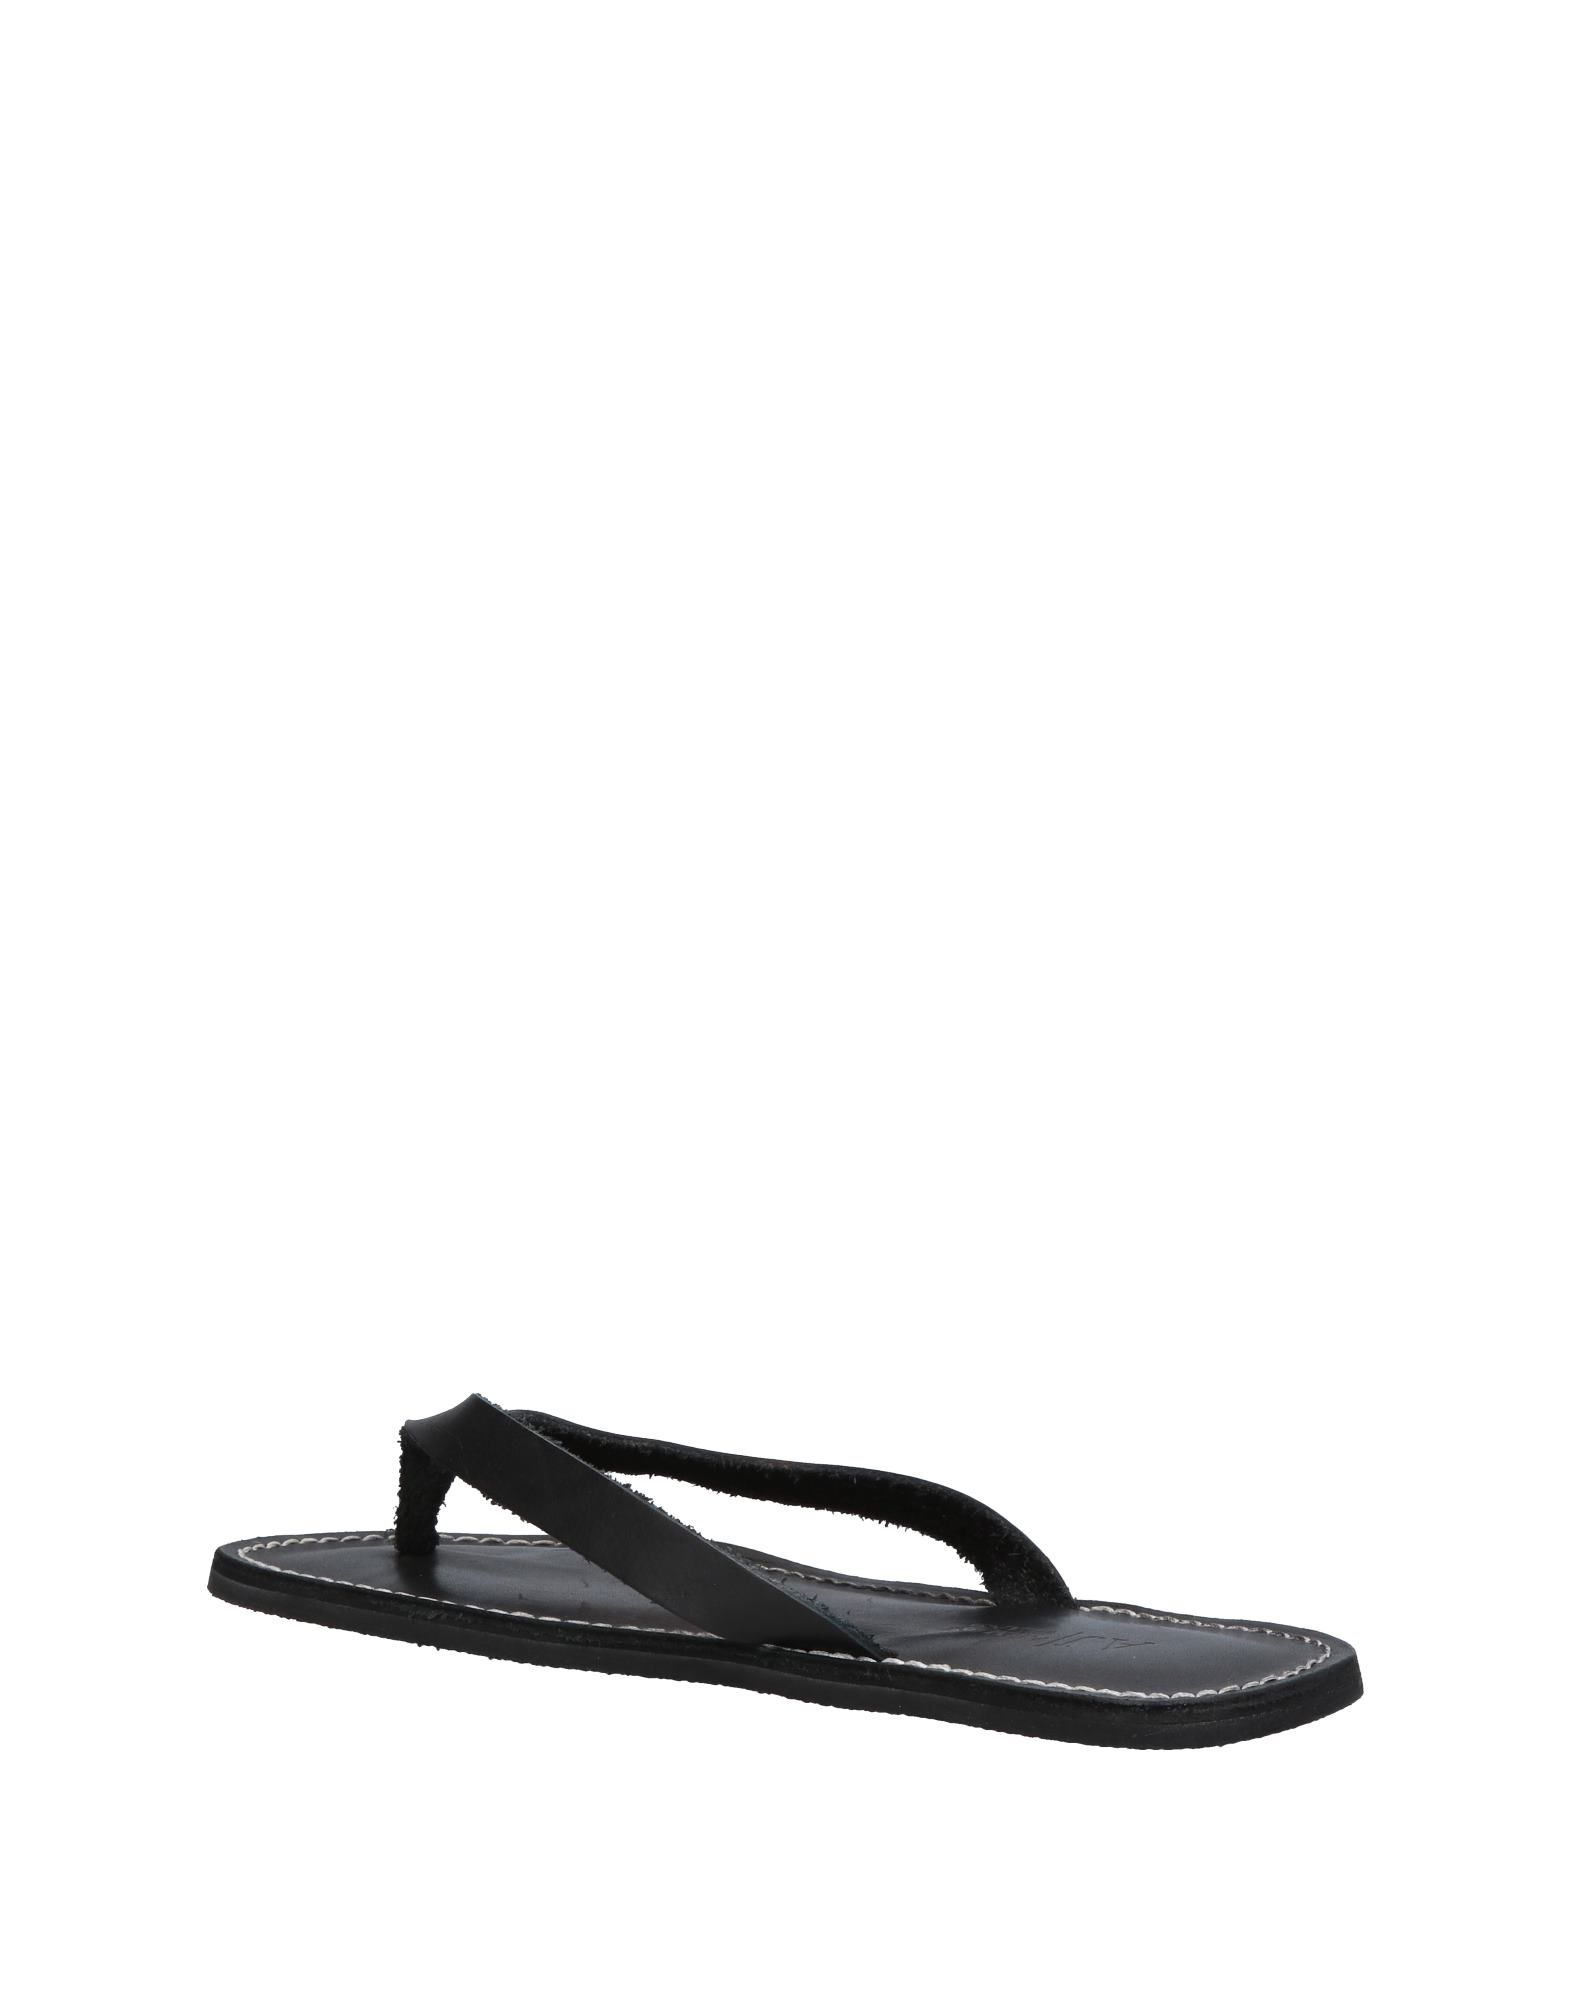 Rabatt echte Schuhe Armani 11401021VV Jeans Dianetten Herren  11401021VV Armani 8337f2